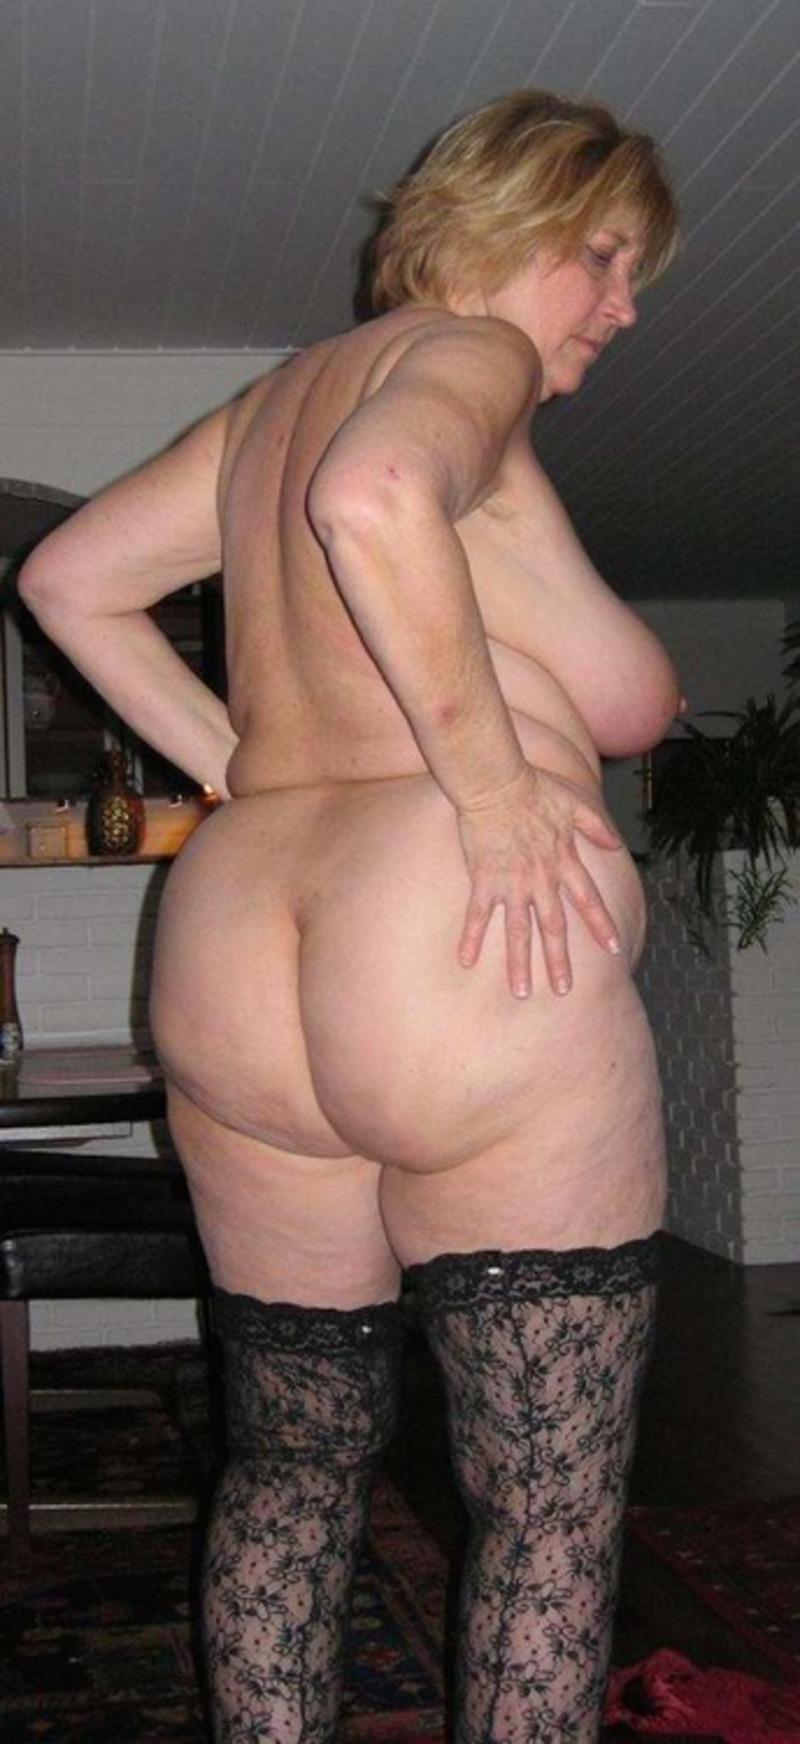 Burning in breast area